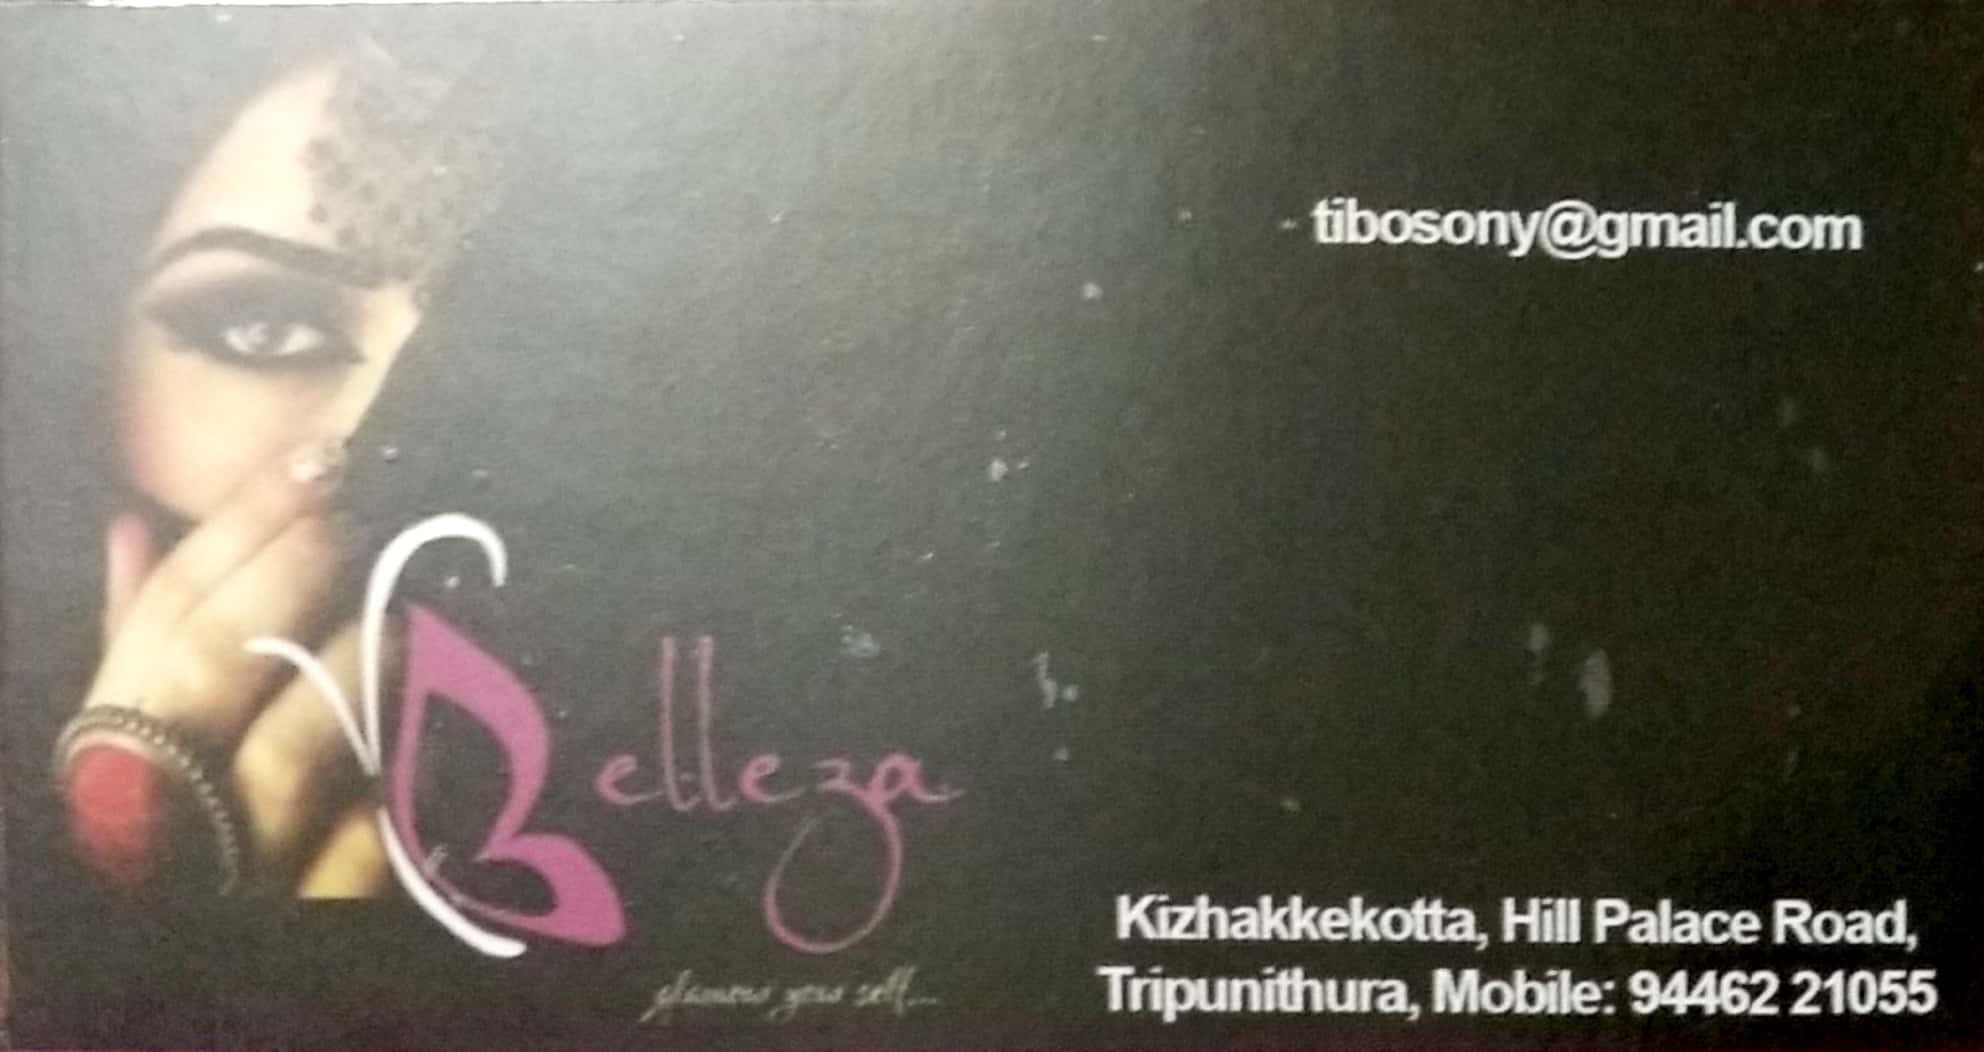 BELLEZA, FANCY & COSTUMES,  service in Thrippunithura, Ernakulam